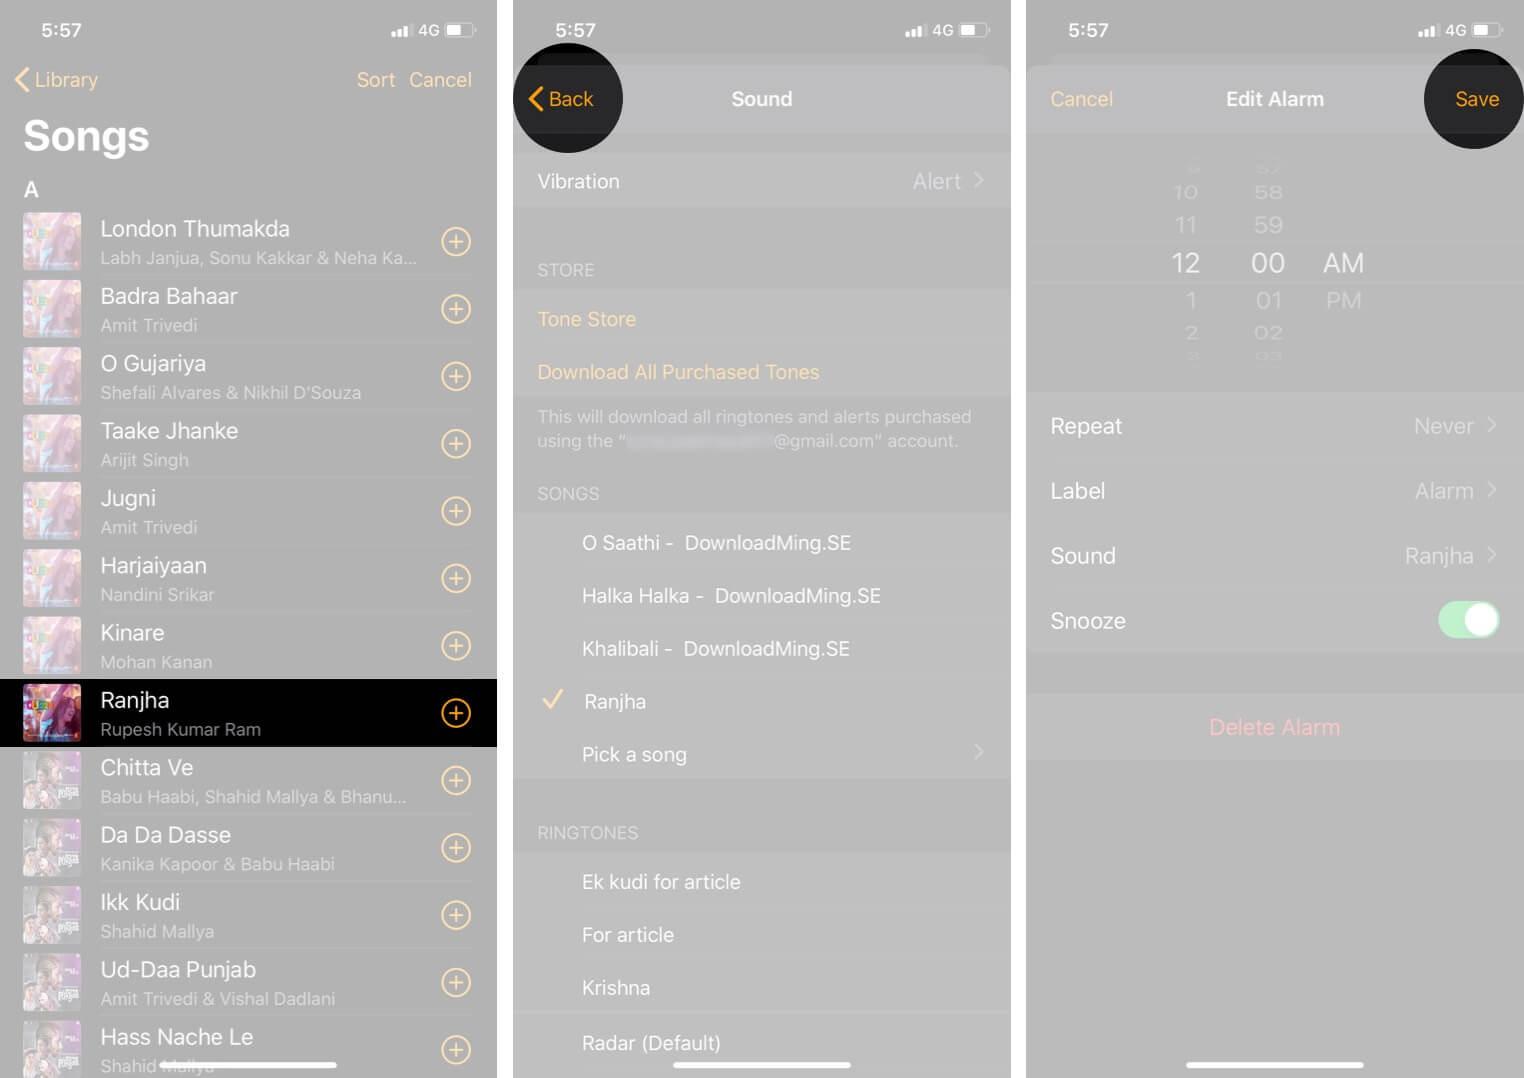 Set a Custom Alarm Tone in iOS 13 on iPhone